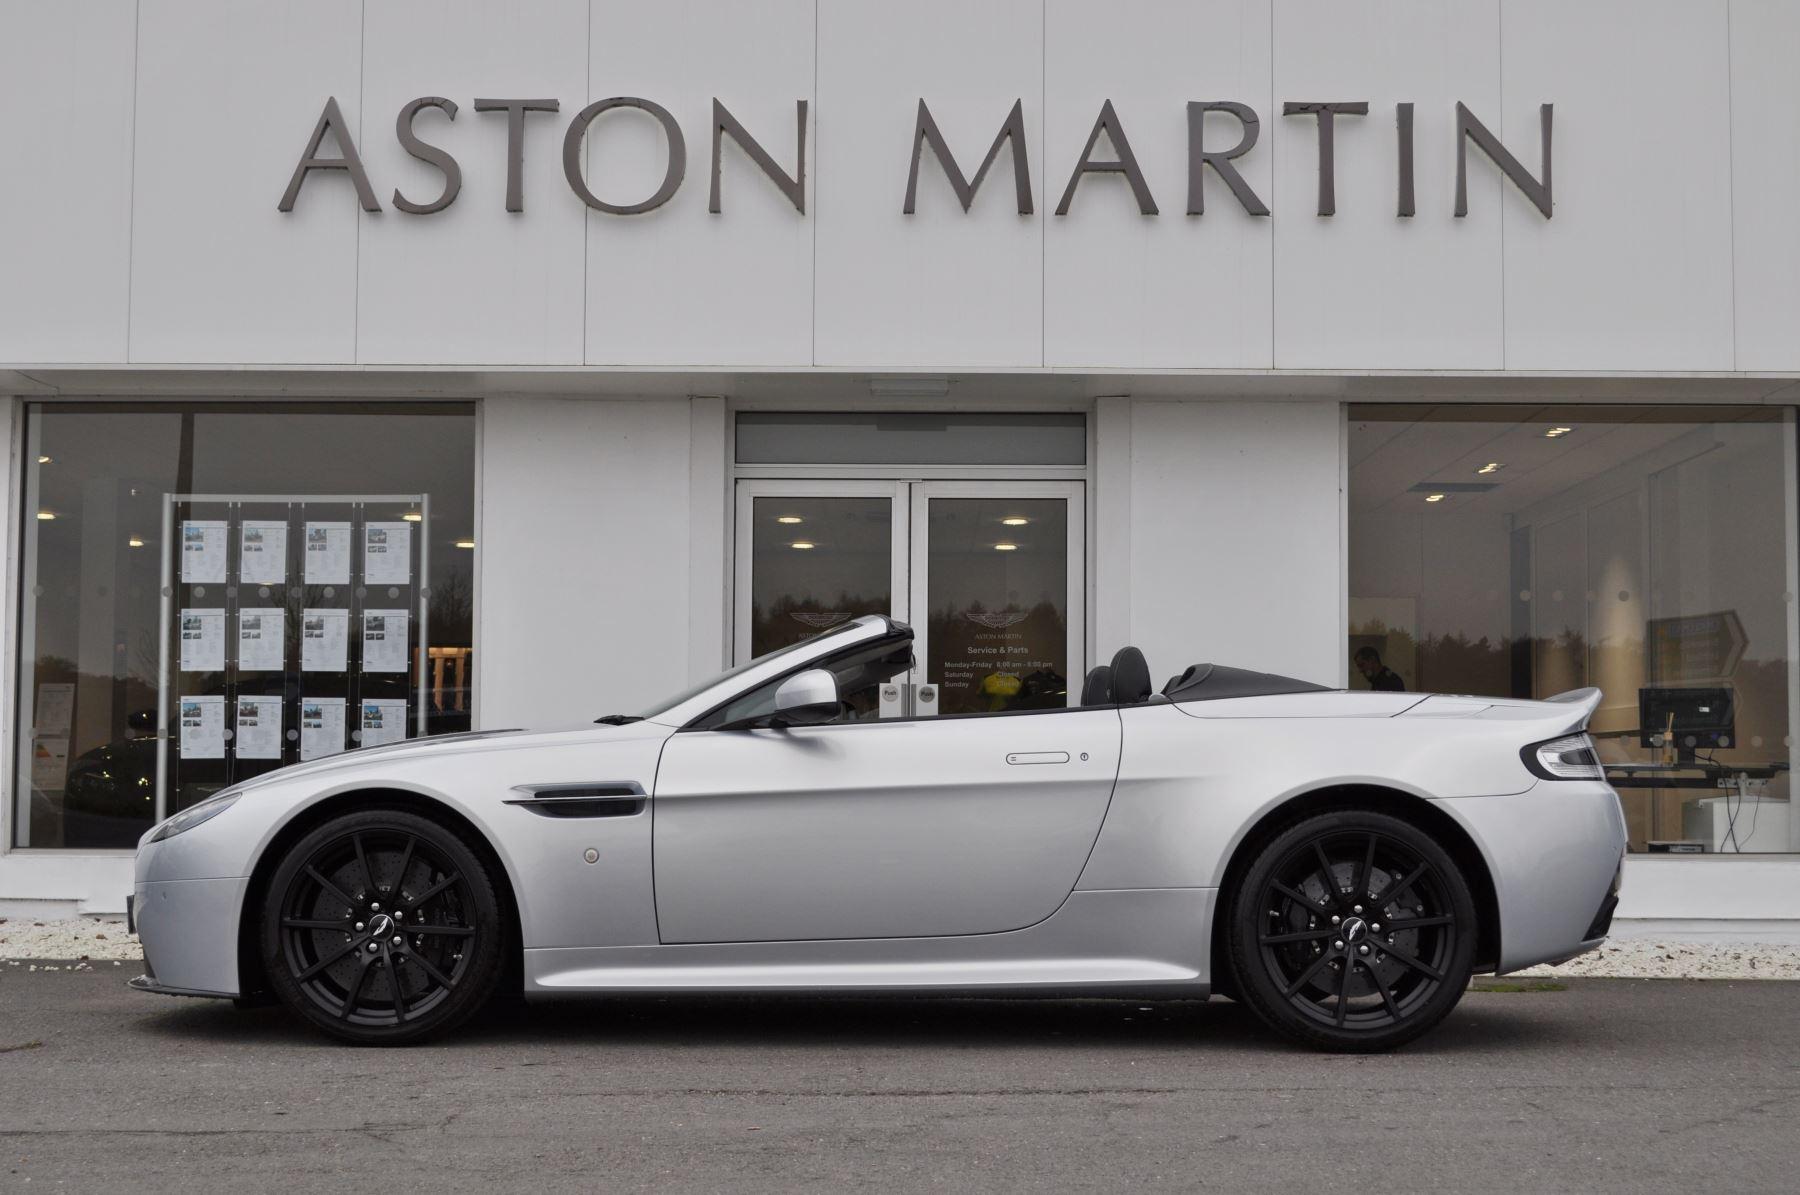 Aston Martin V12 Vantage S S 2dr Sportshift III image 5